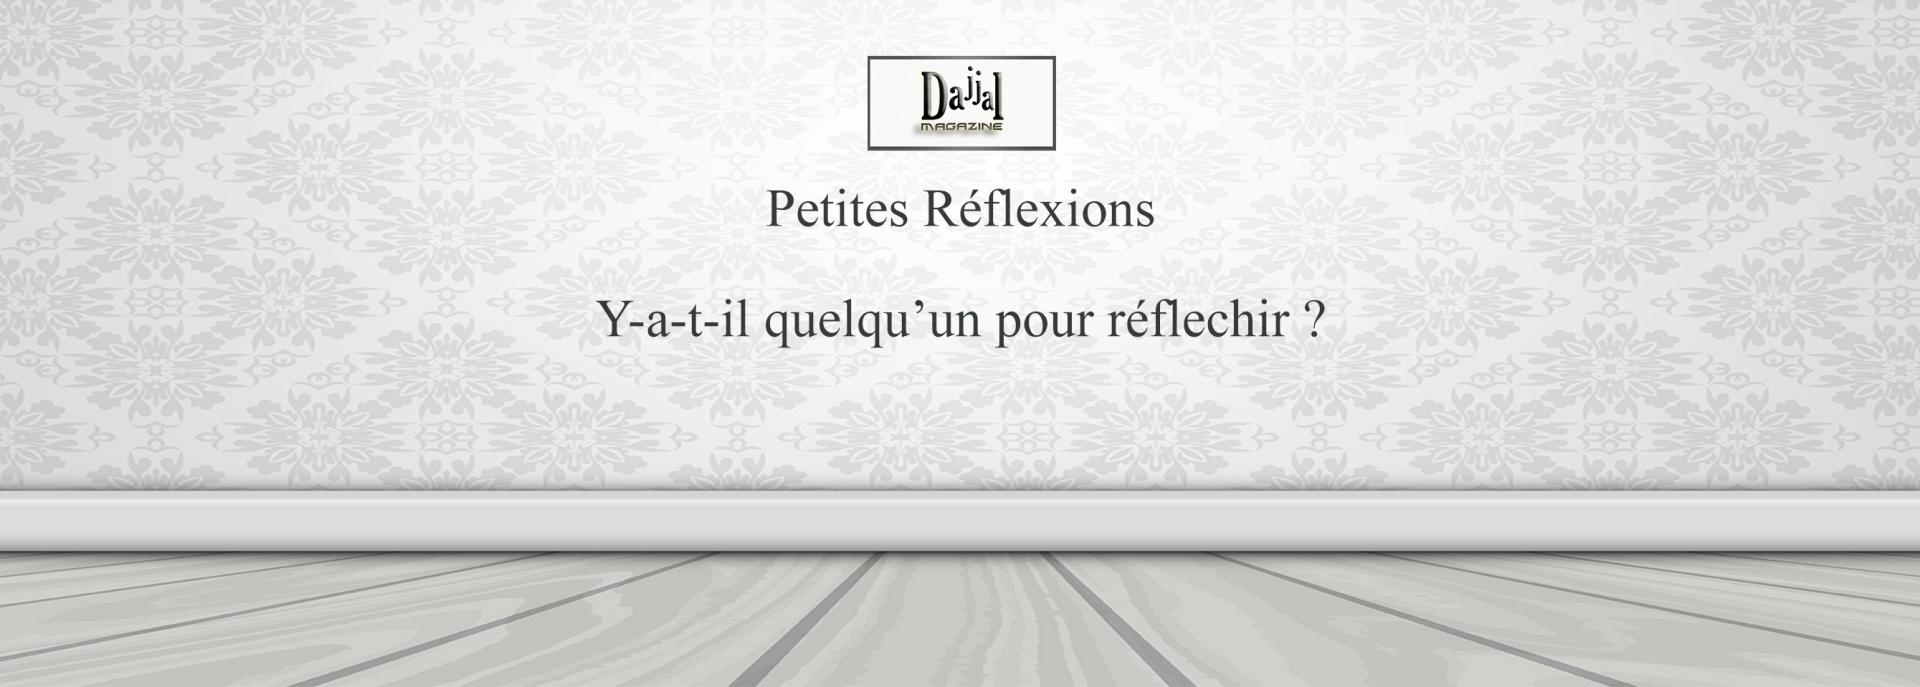 Petites reflexions